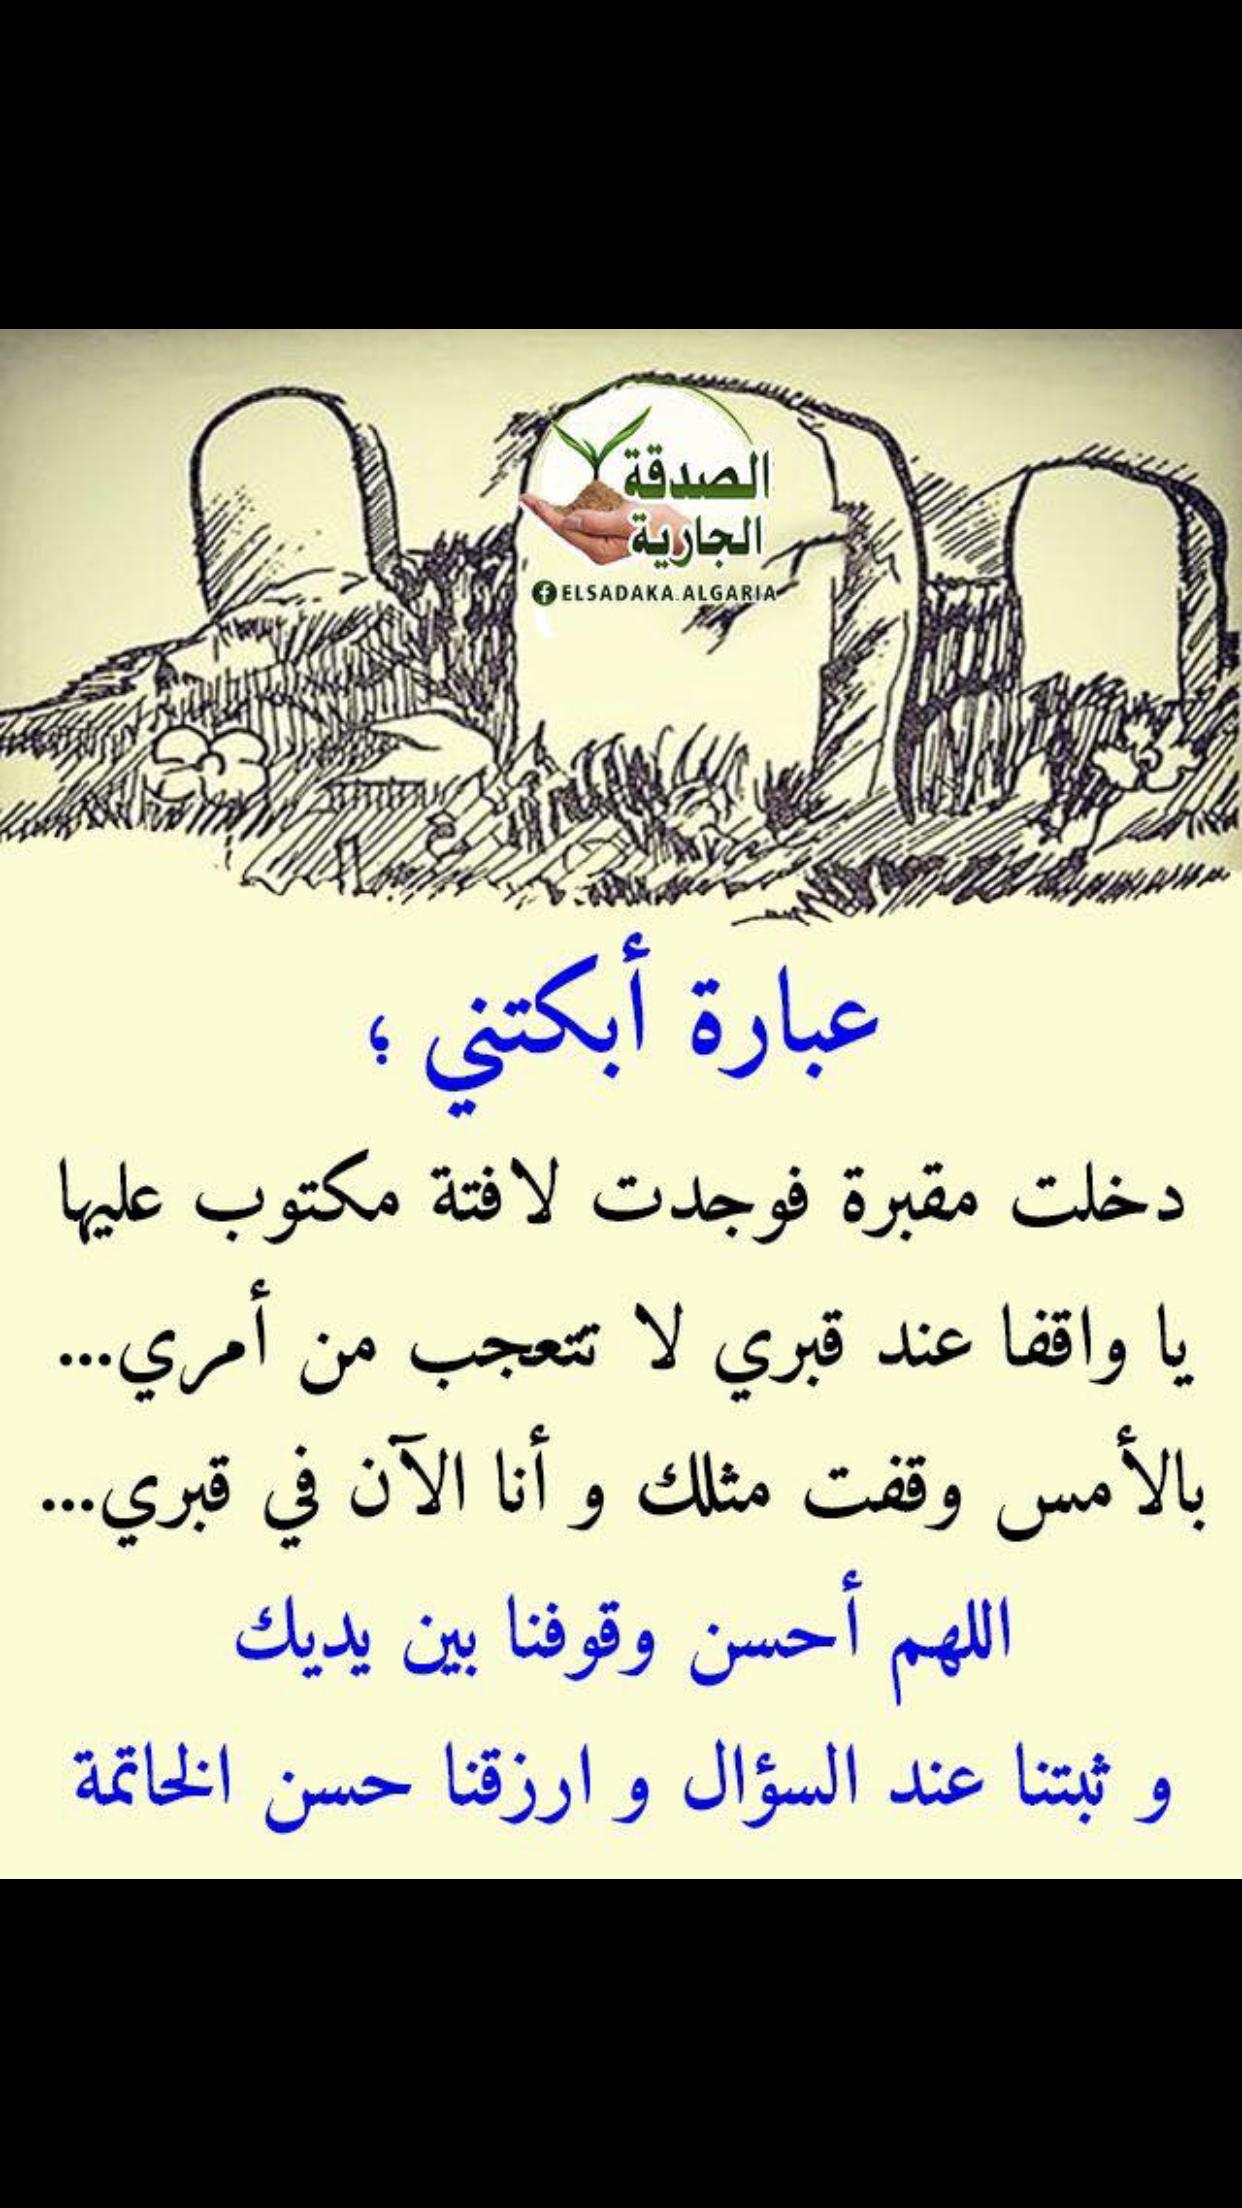 اللهم امين Wisdom Quotes Life Beautiful Arabic Words Islam Facts